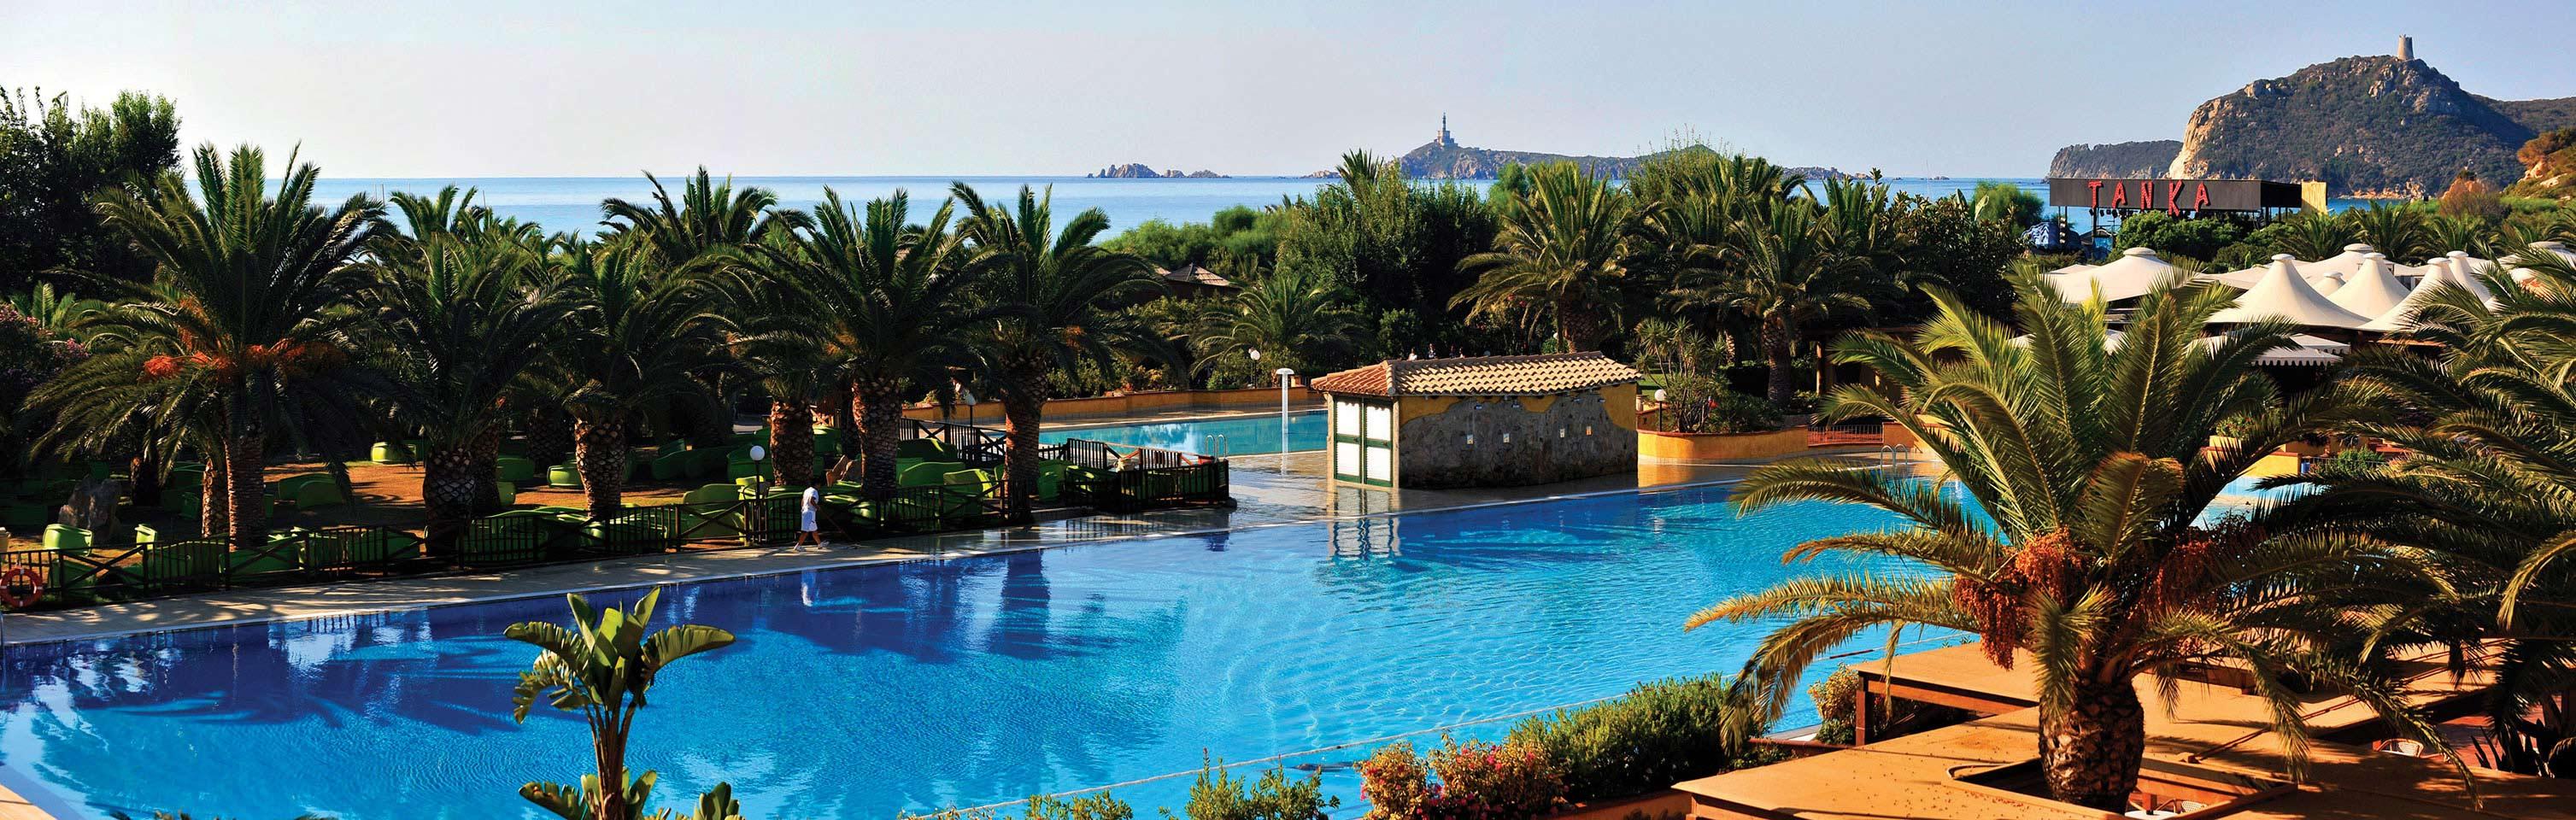 Photo Gallery Tanka Village Resort Golf Spa